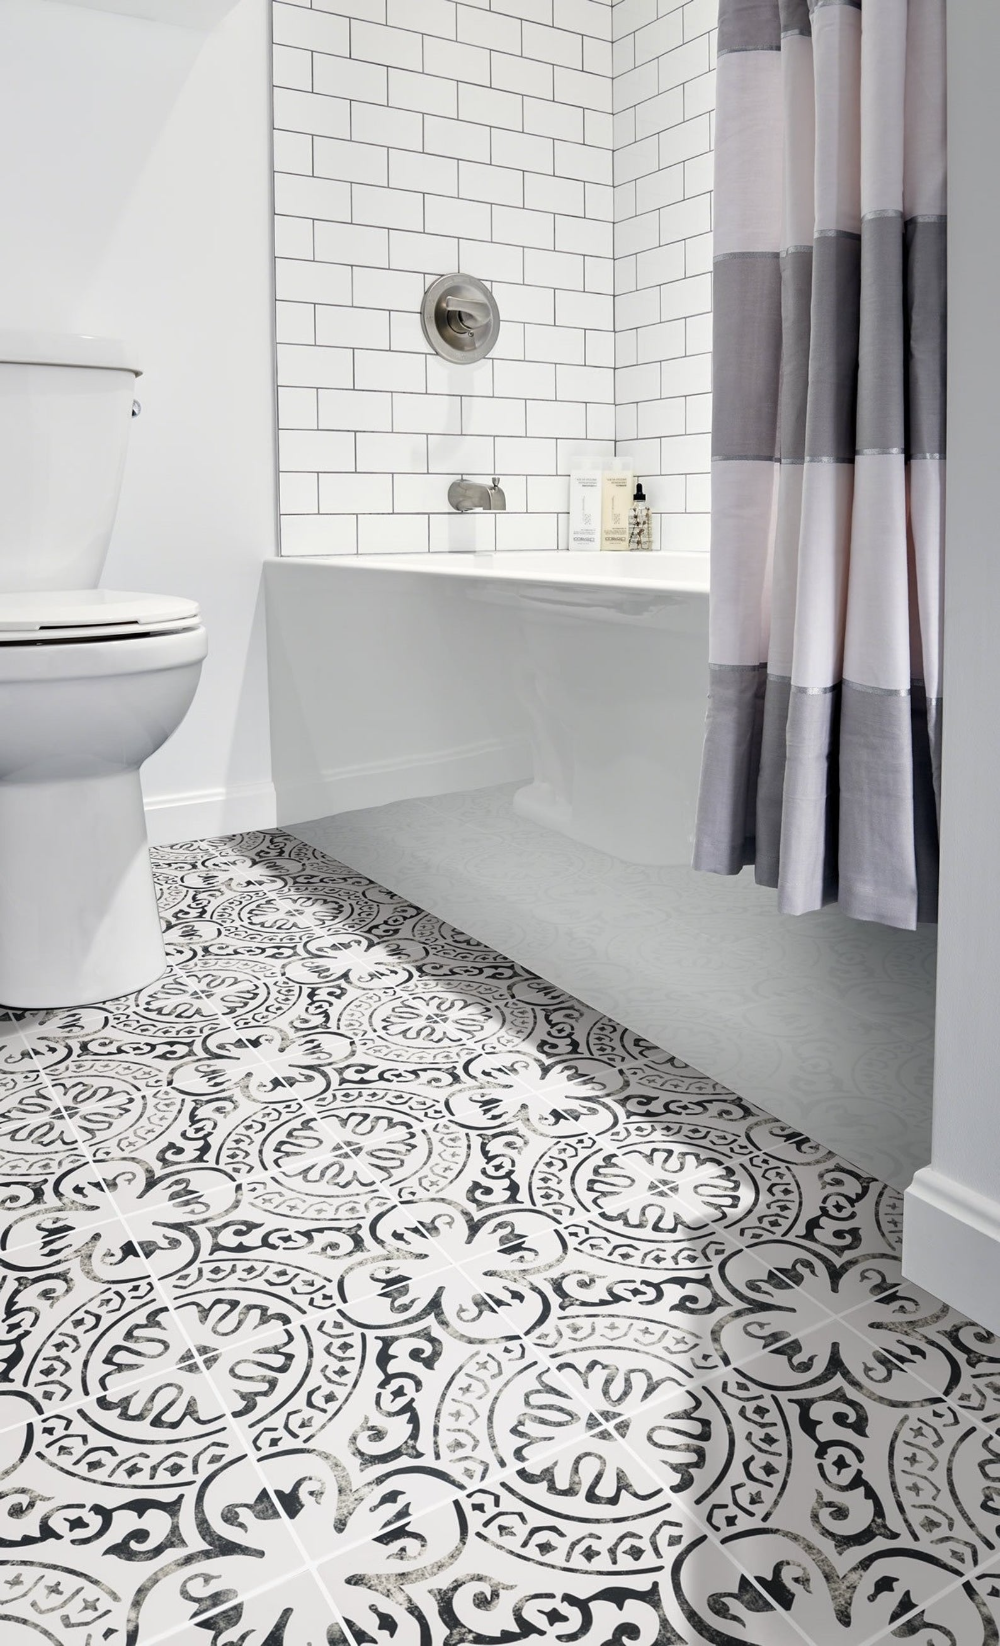 Stair Riser Decal Vinyl Tile Stickers Vintage Kitchen Etsy In 2020 Vinyl Tile Bathroom Floor Tiles Vinyl Flooring